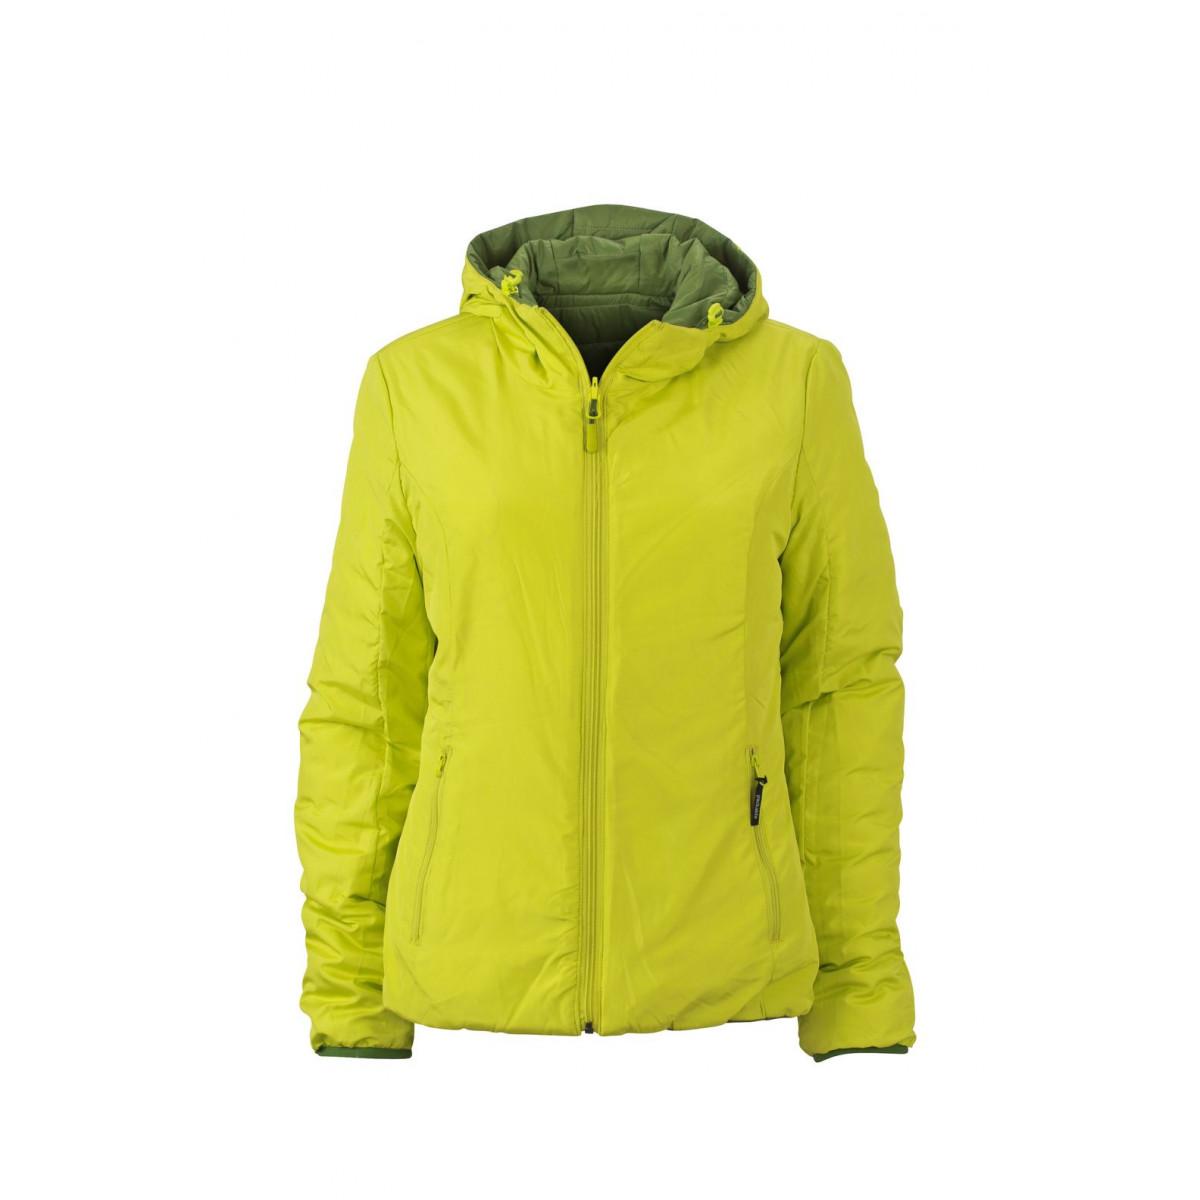 Куртка женская JN1091 Ladies Lightweight Jacket - Насыщенный зеленый/Ярко-желтый